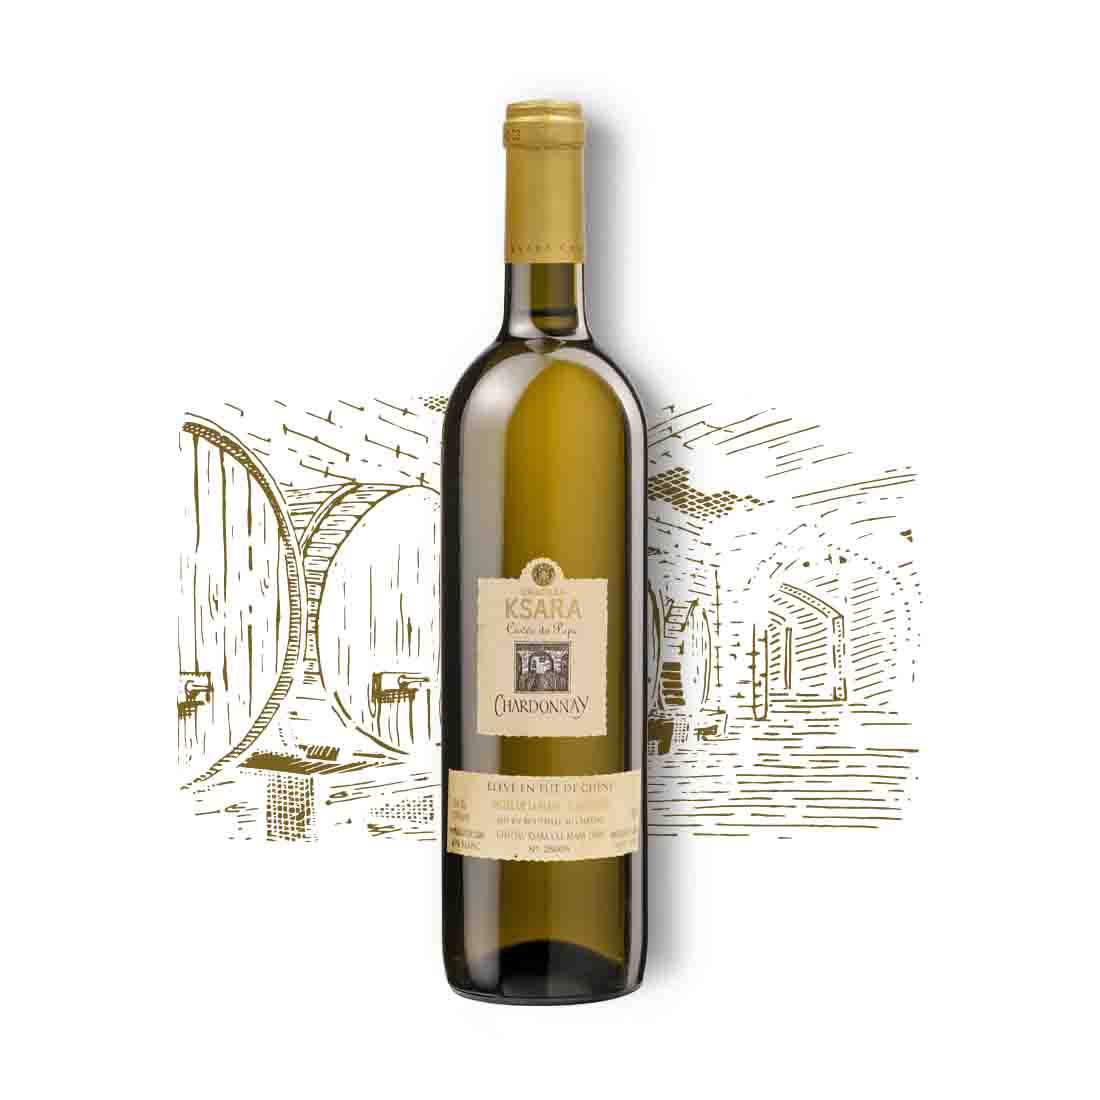 ksara oaked collectible vintage aging rare gold Lebanese white wine chardonnay cuvee du pape bekaa